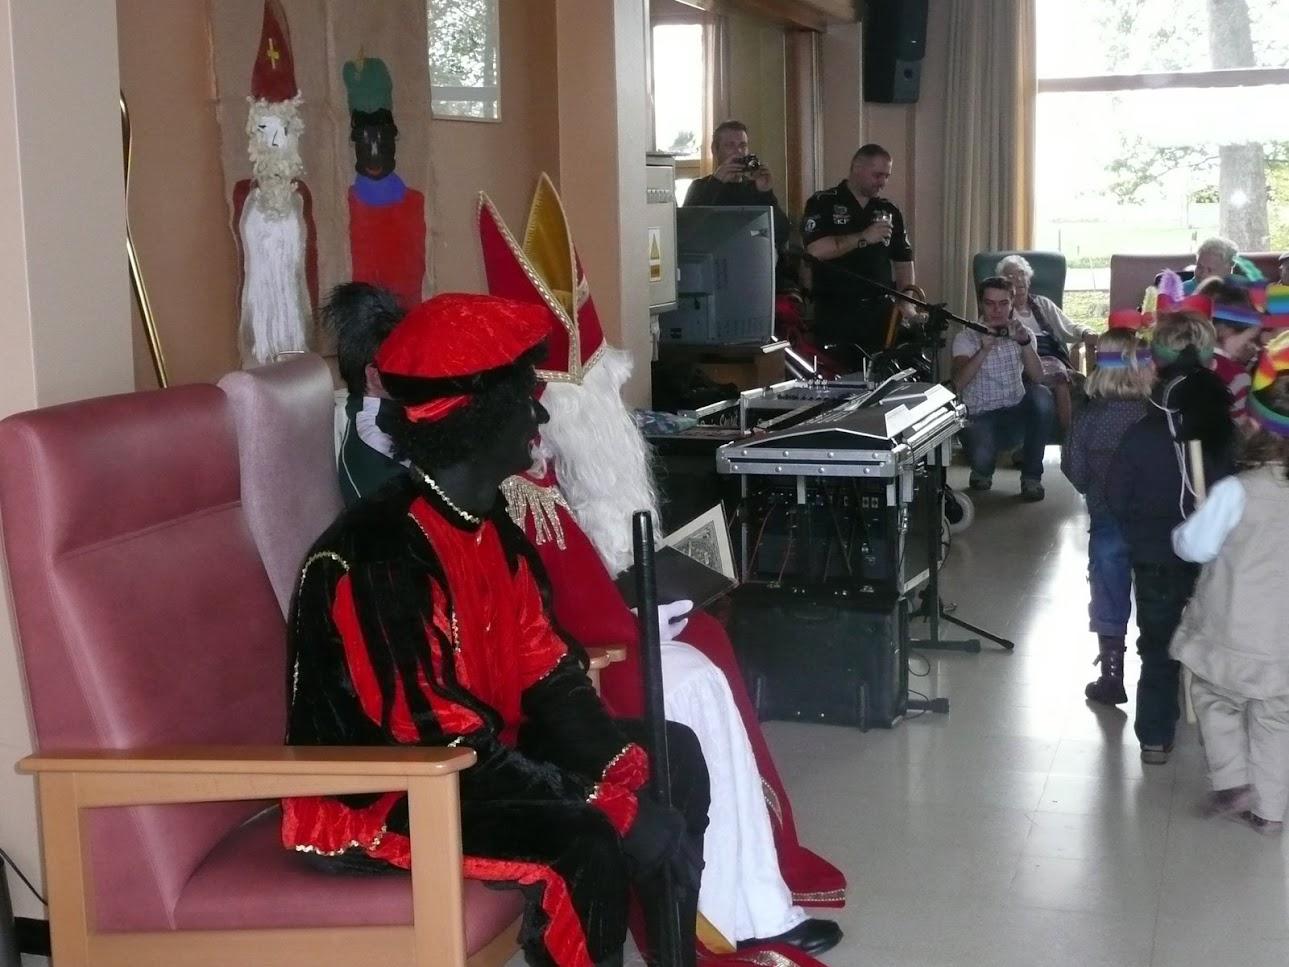 Sint-Maarten 2008